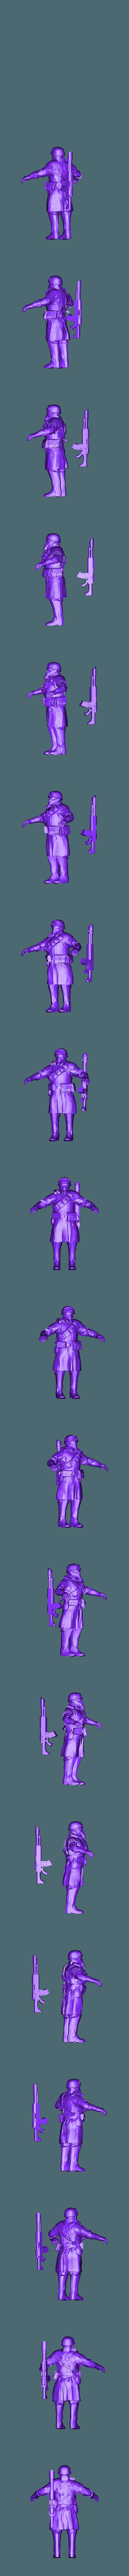 ThatEvilOnes_Printable_Steel_Legion_Scion_Base.obj Download free OBJ file Community Guardsmen Project Hub • Design to 3D print, ThatEvilOne